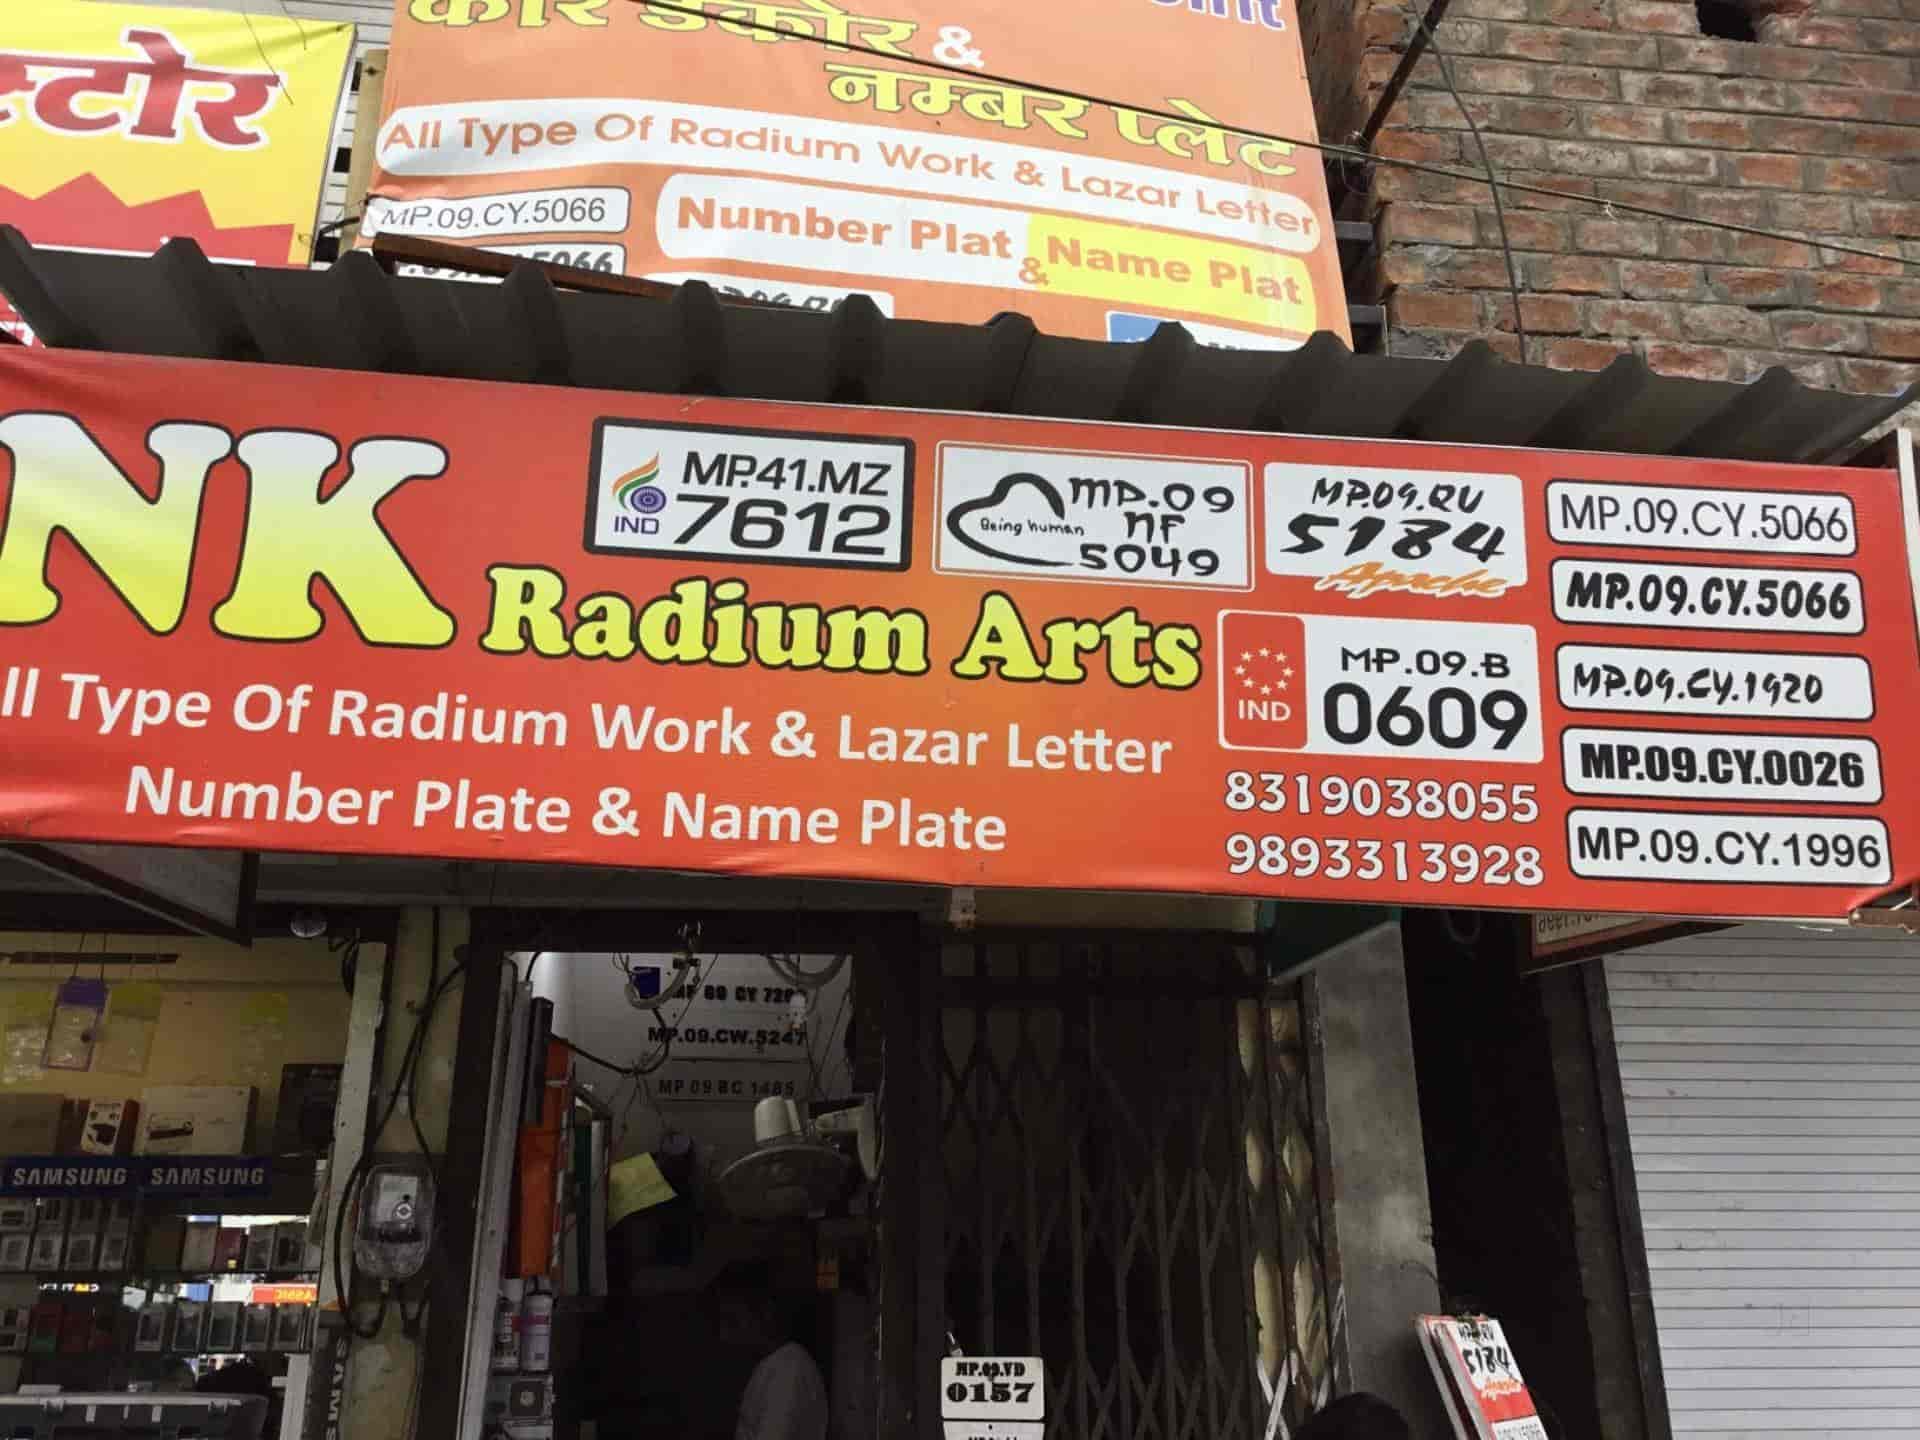 N K Radium, Bengali Square - Number Plate Dealers in Indore